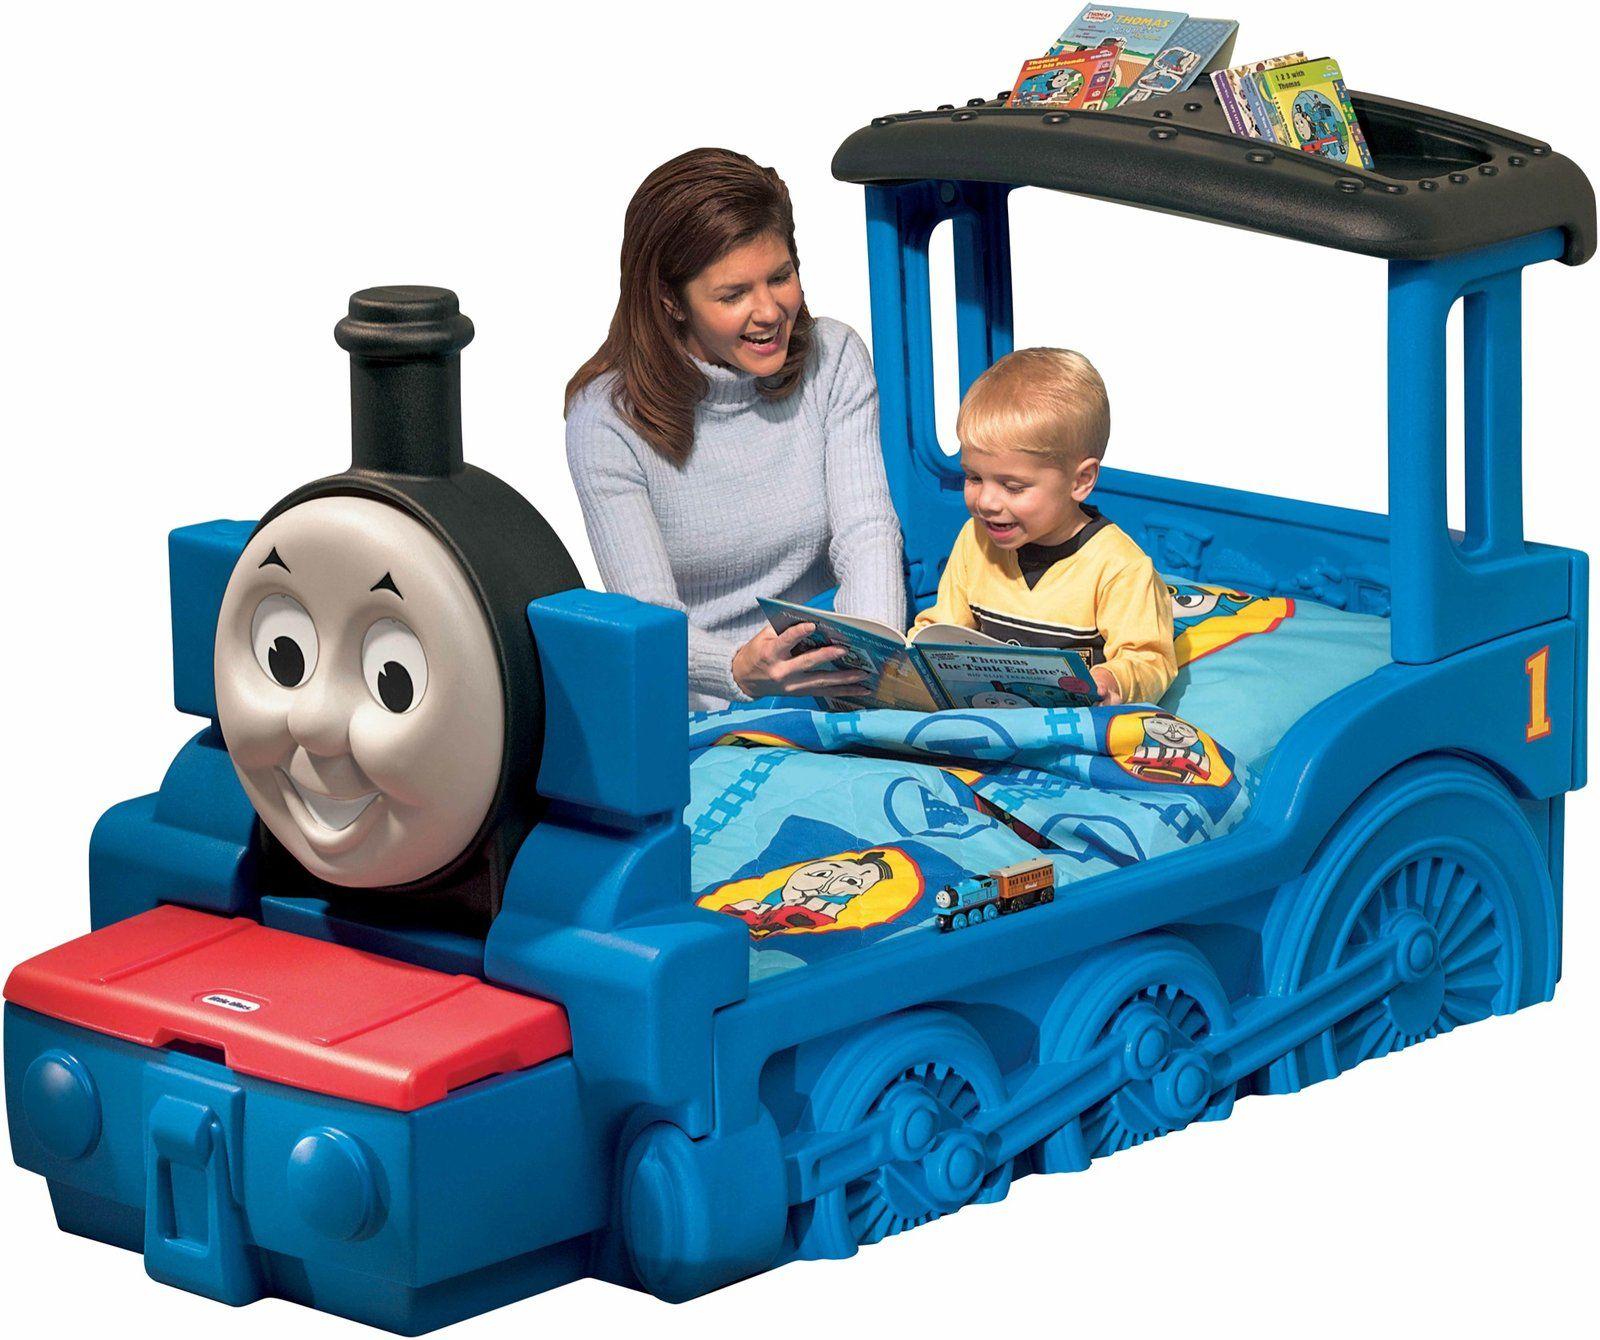 Thomas & Friends Train Bed Train bedroom